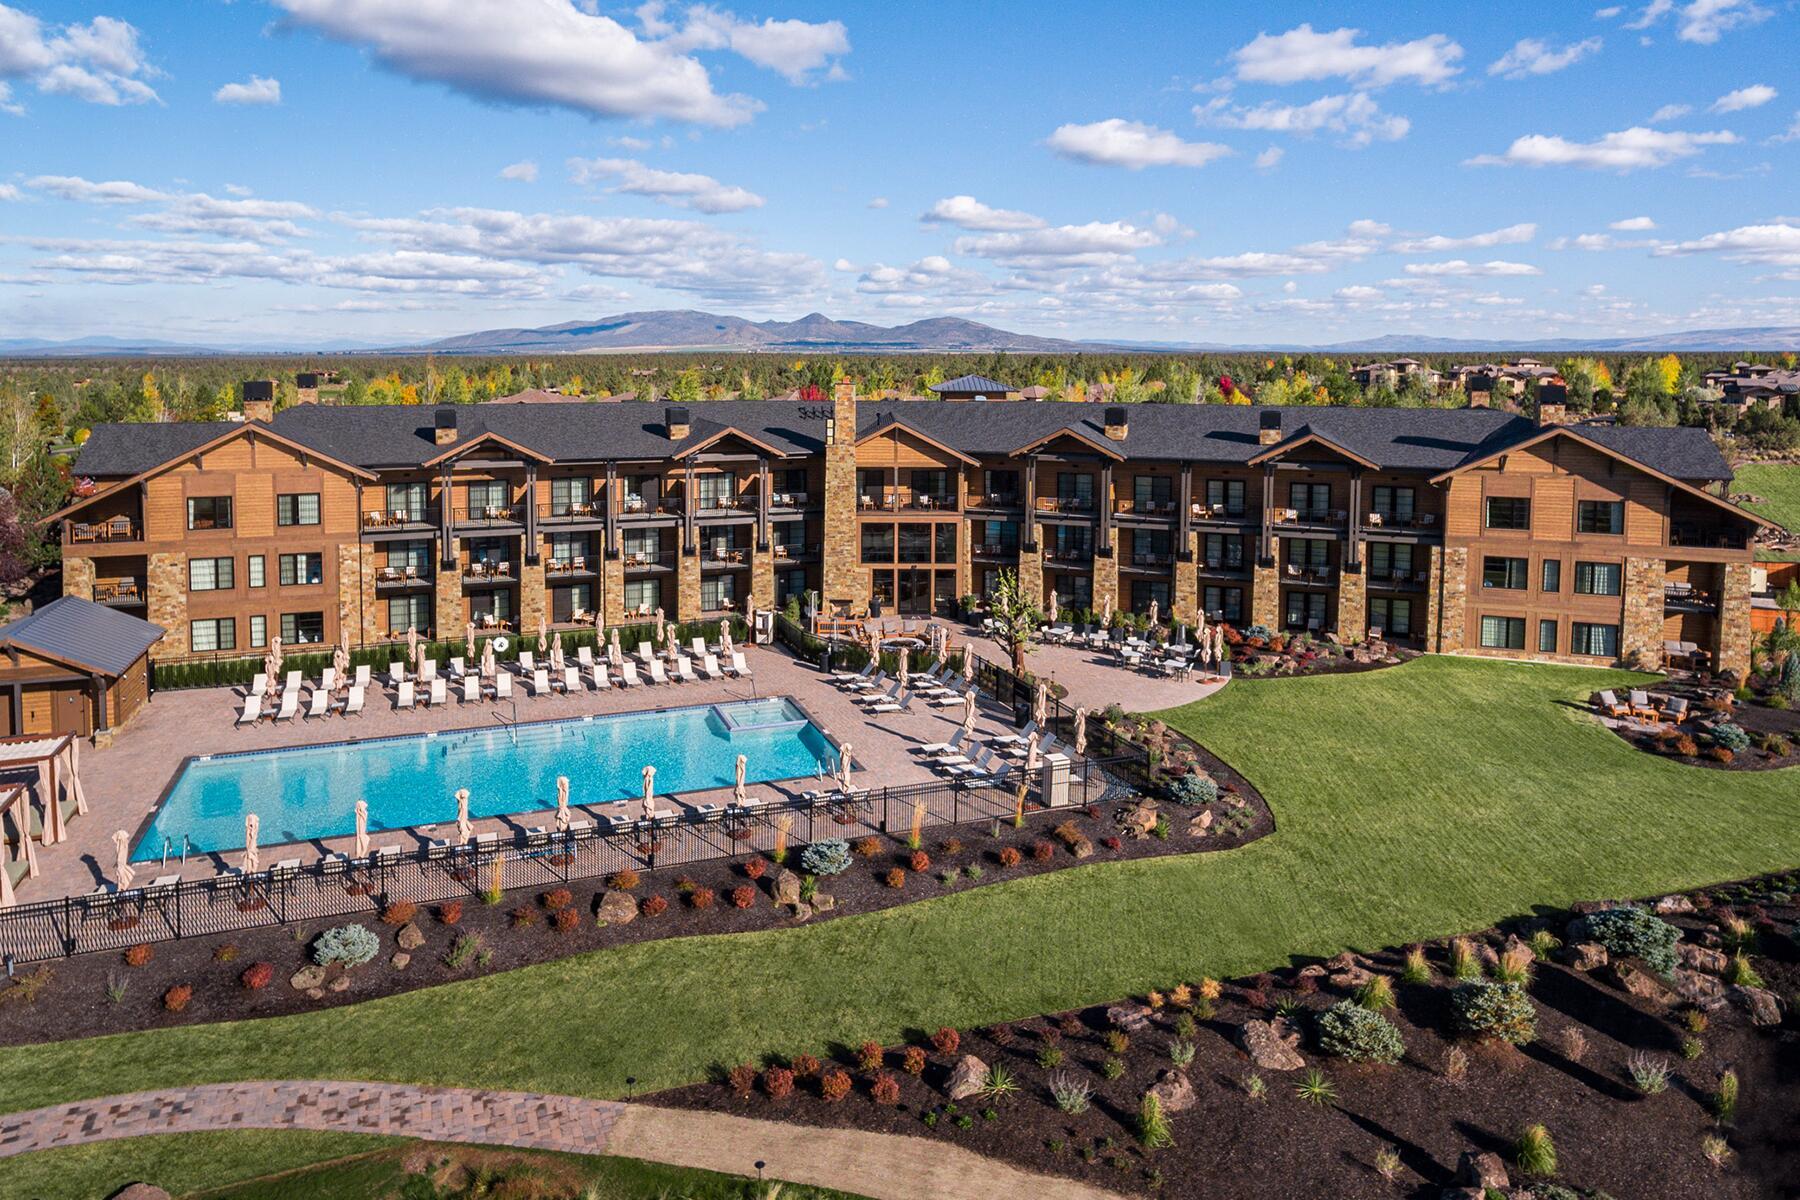 05_RentEntireVillaInnBnb__PronghornResort_5 Huntington Lodge Pool